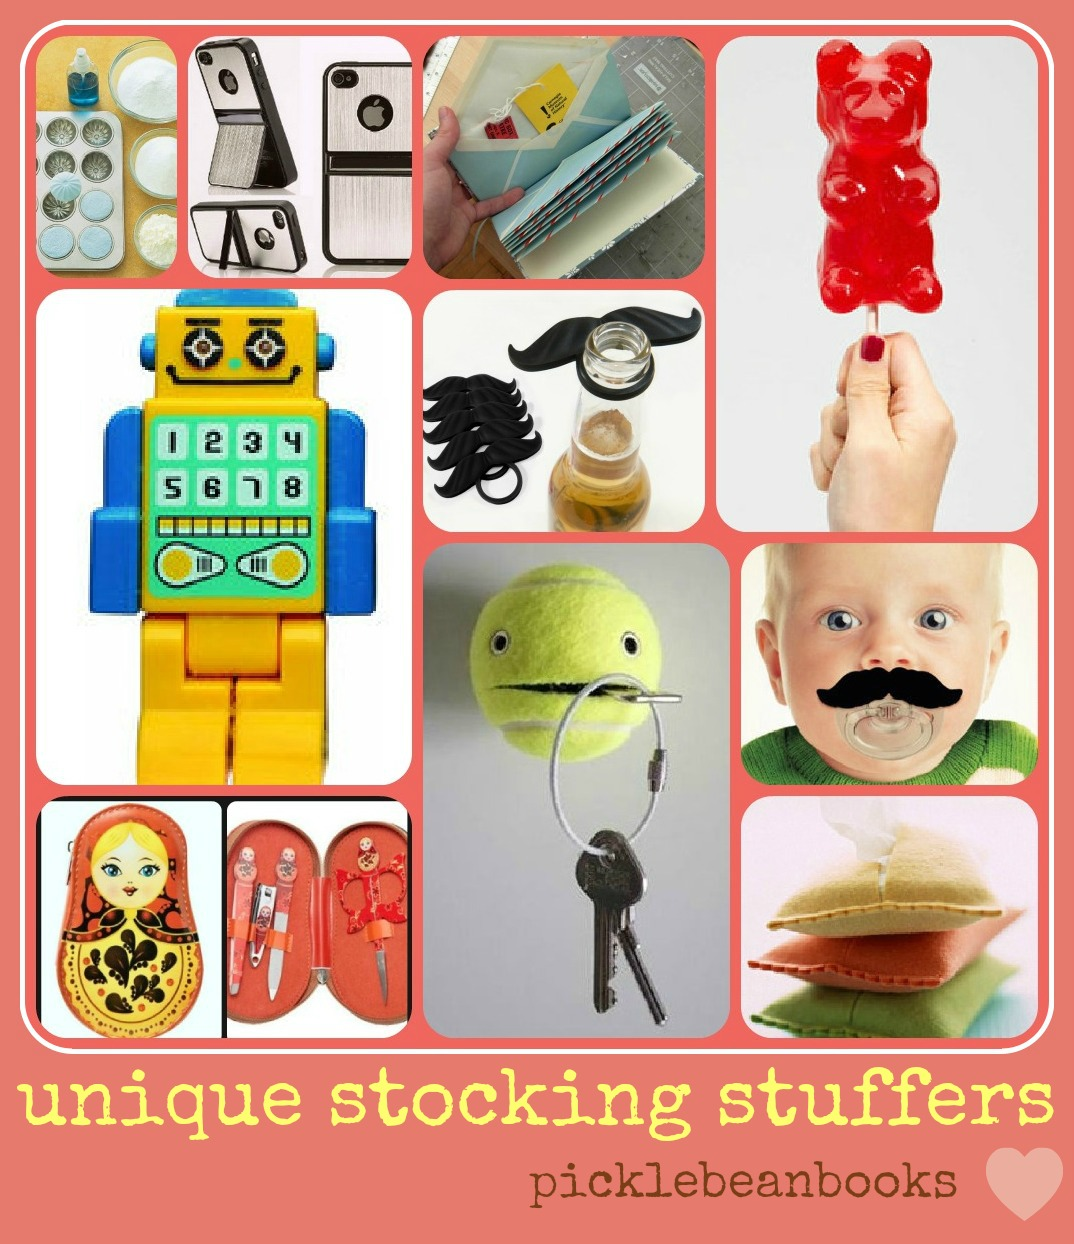 Picklebeanbooks Unique Stocking Stuffers Mini Gifts